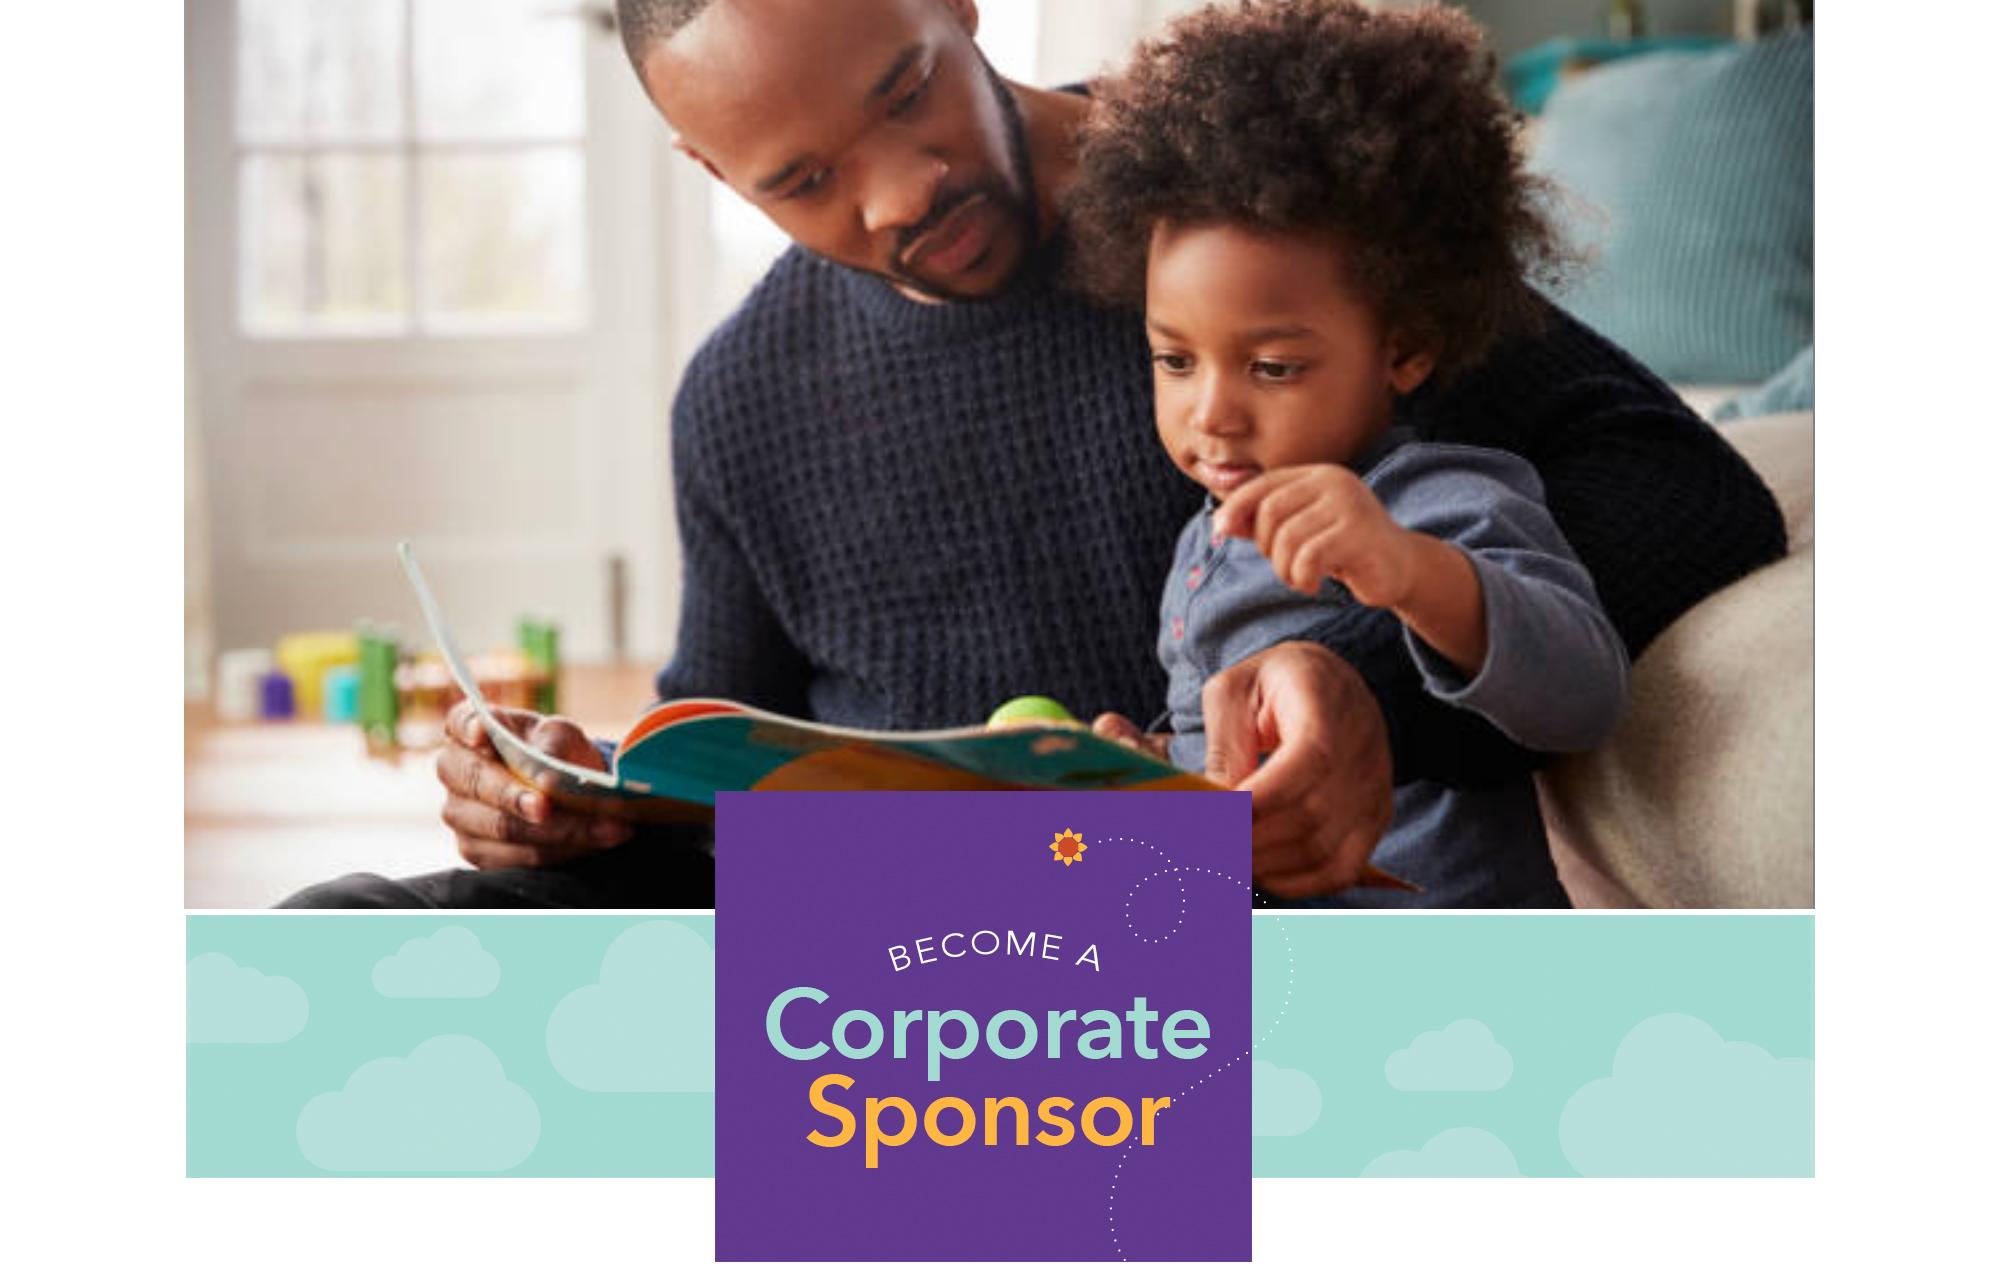 SponsorCorporate_Header.jpg